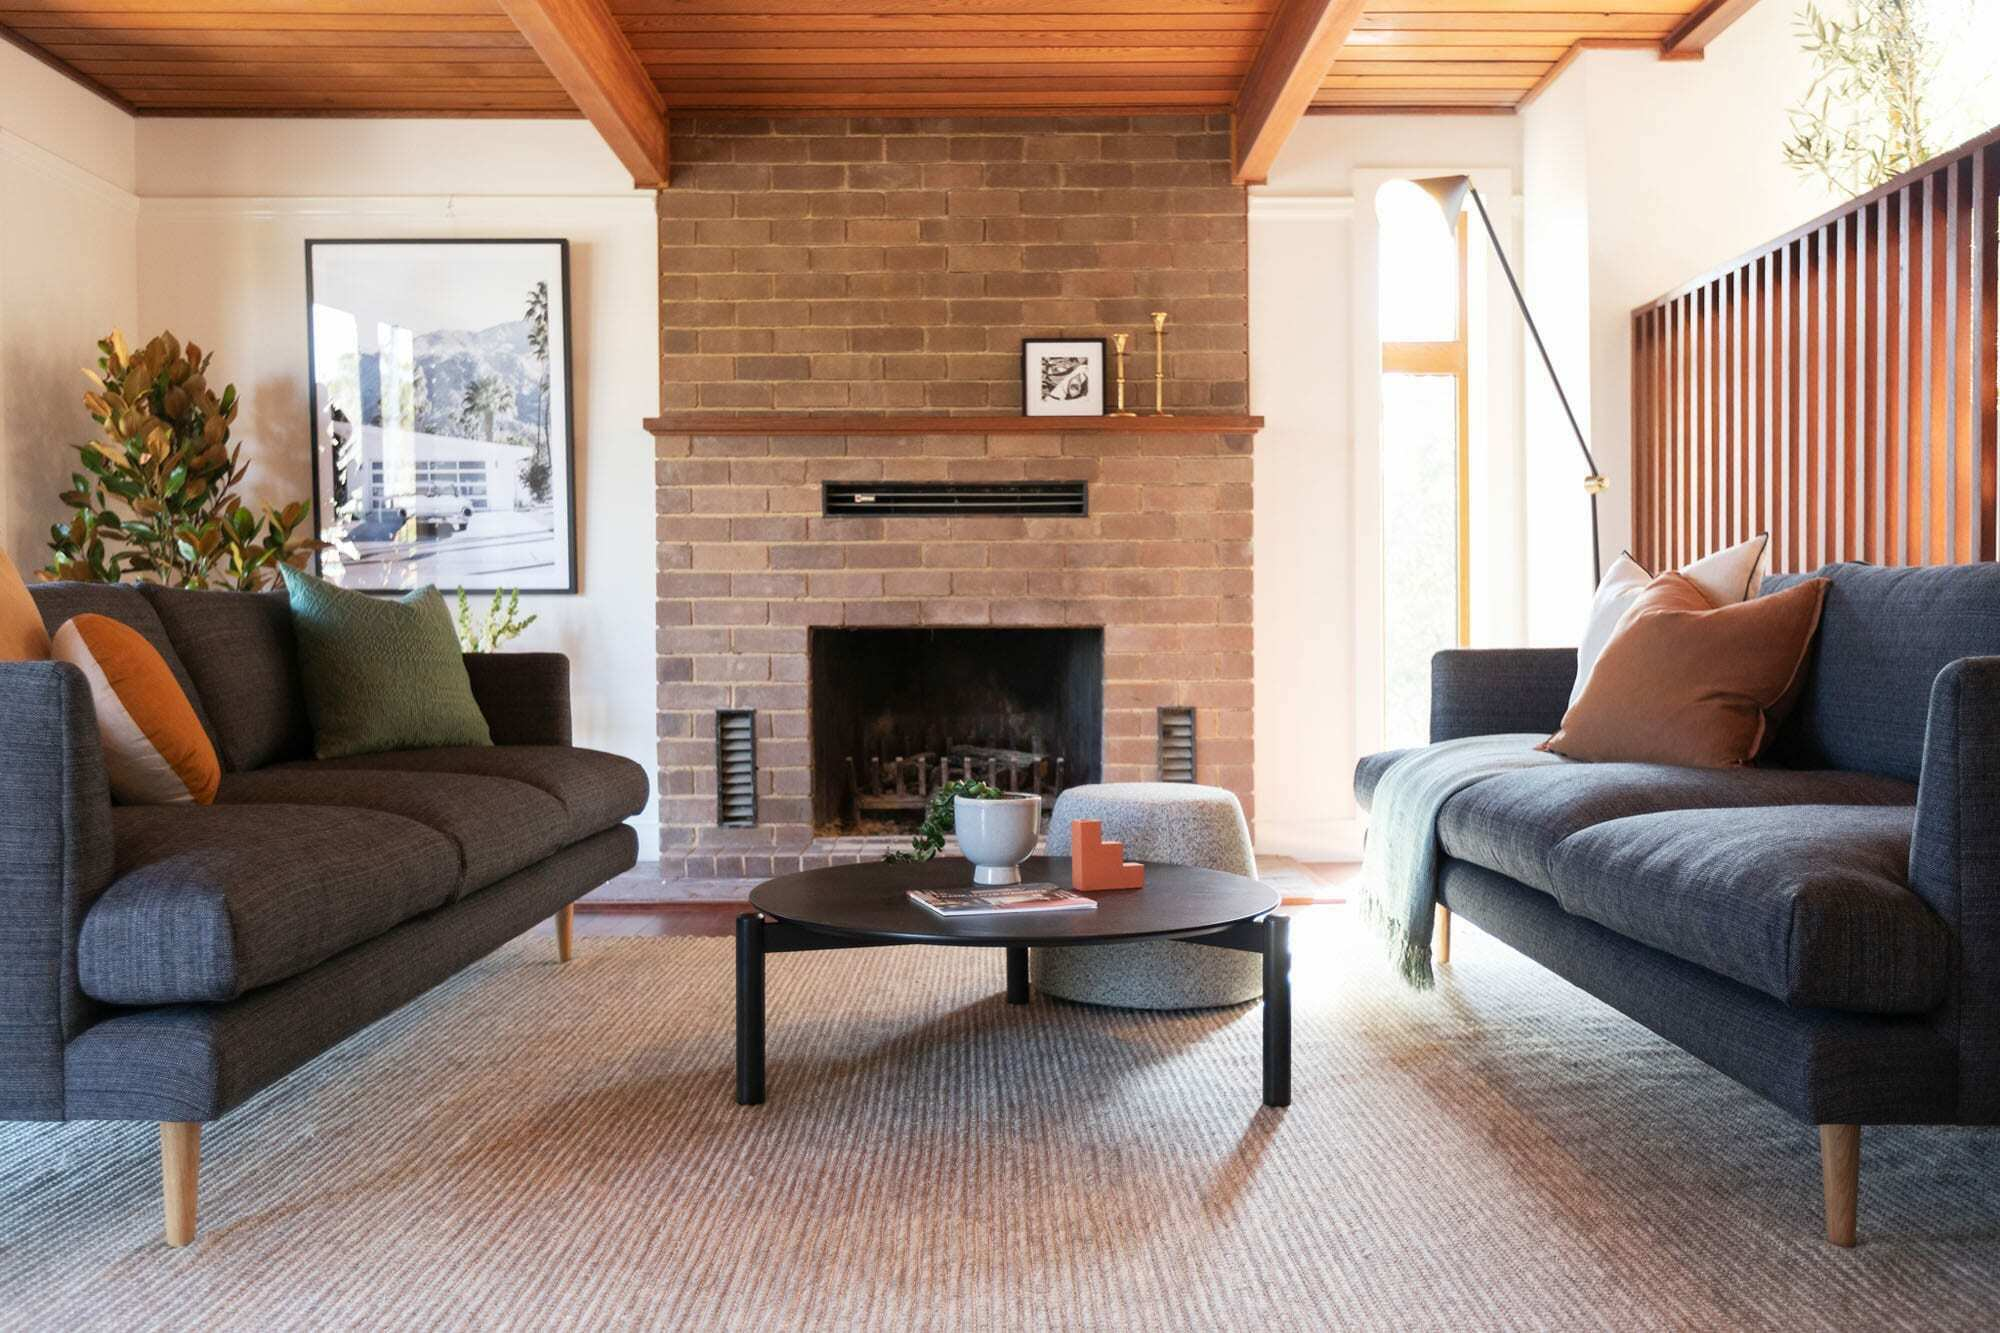 Homes by Howe Canberra builder – Governor Generals' renovation extension – Formal lounge